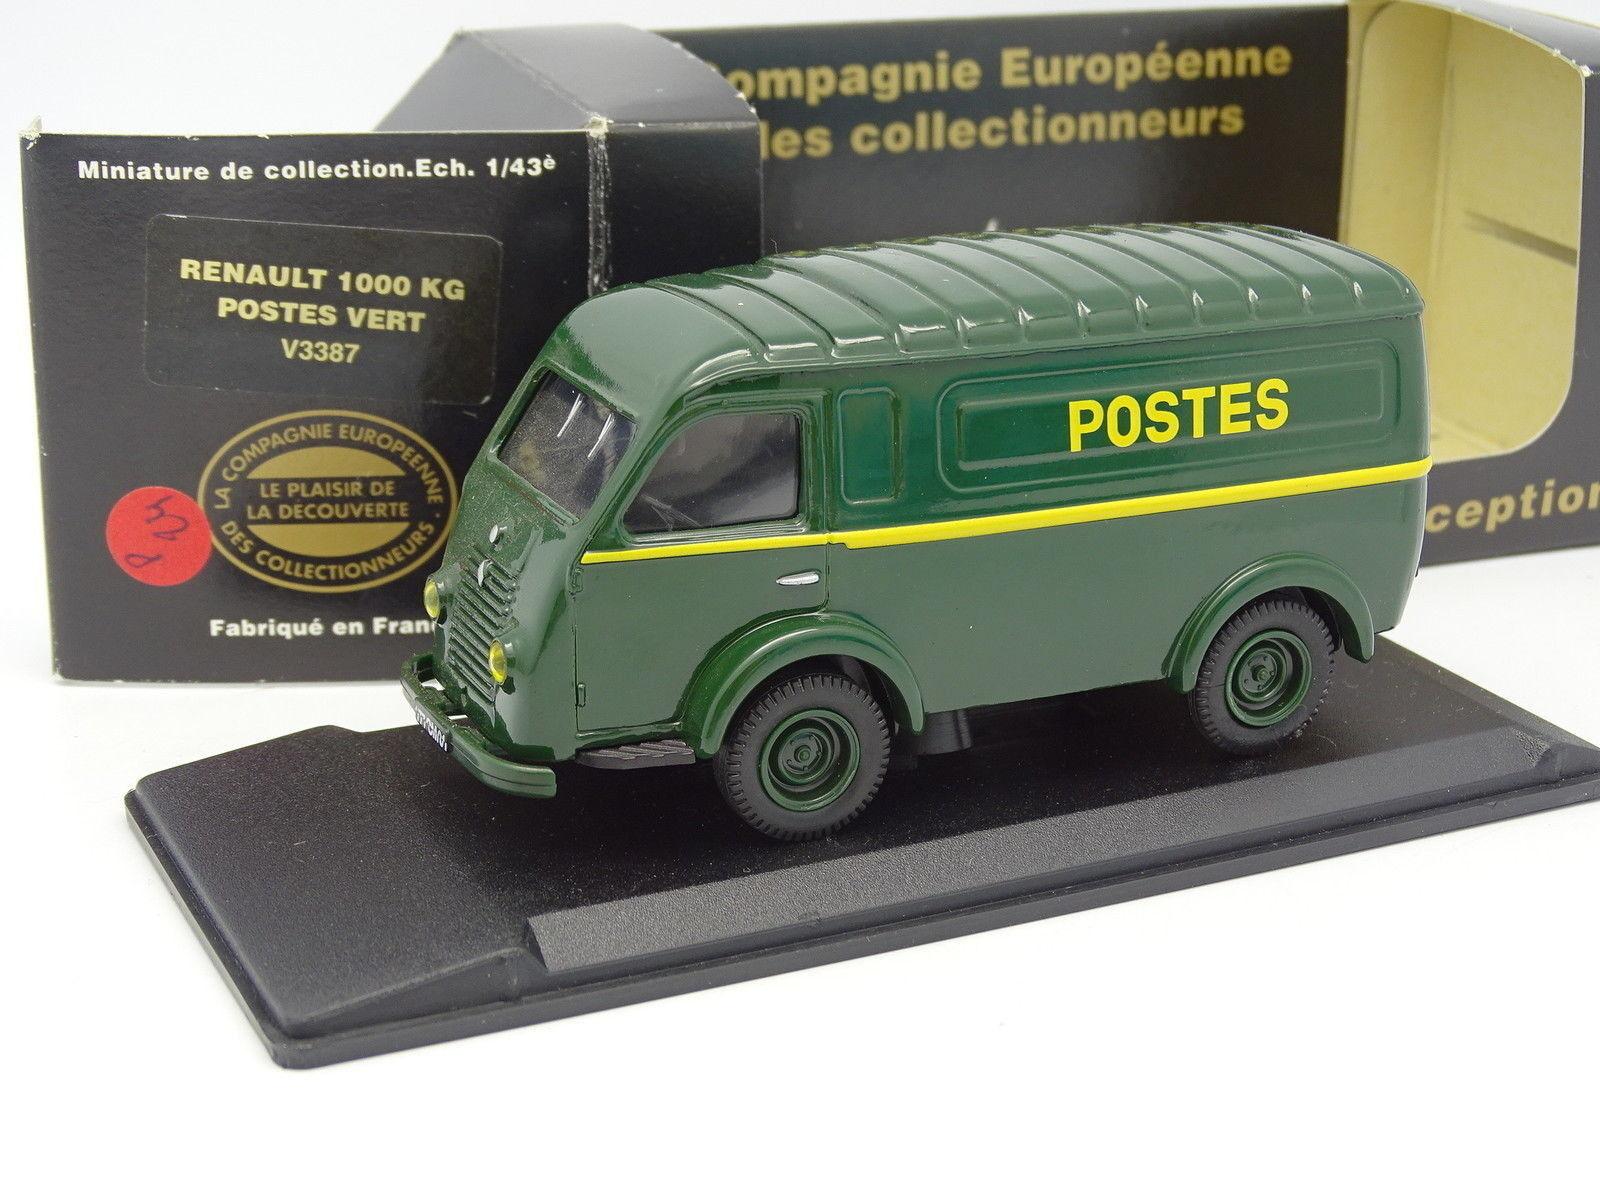 Eligor CEC 1 43 - Renault 1000 KG Posts